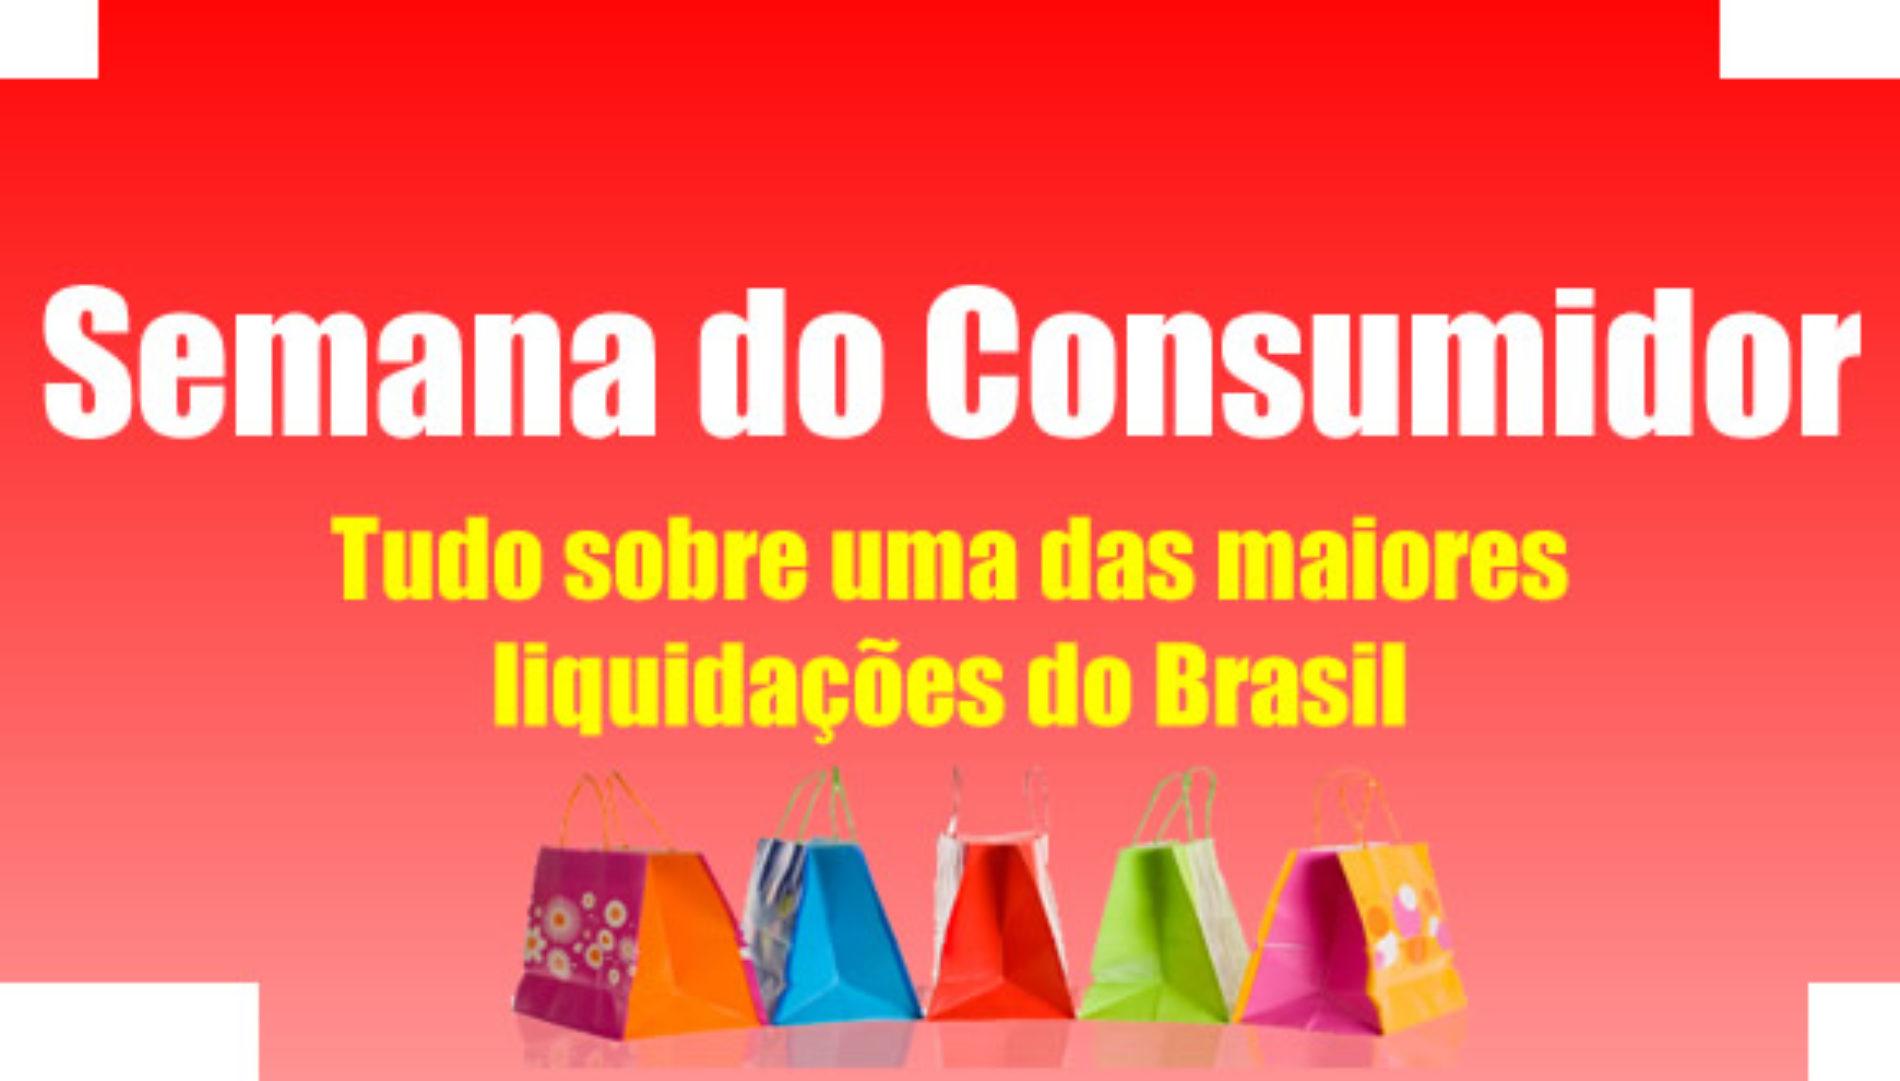 Semana do consumidor